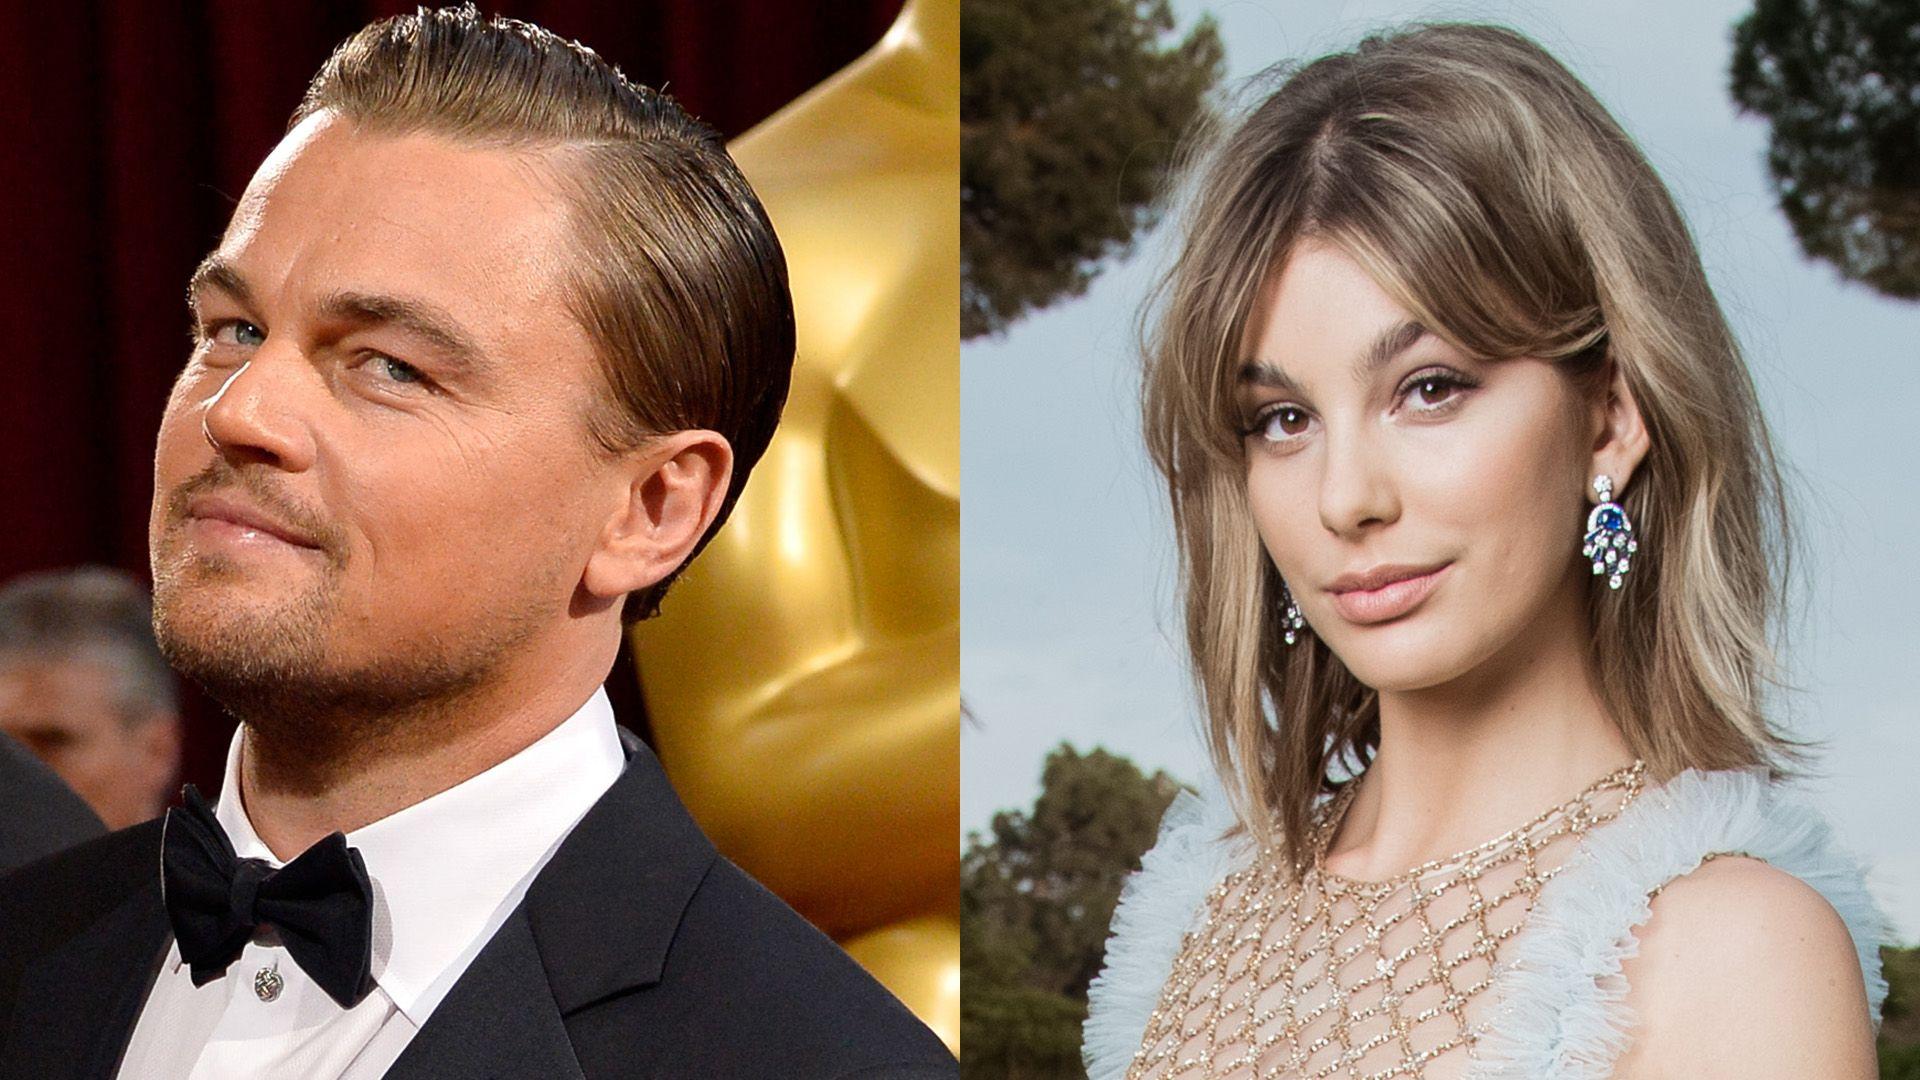 Leonardo dicaprio on dating site